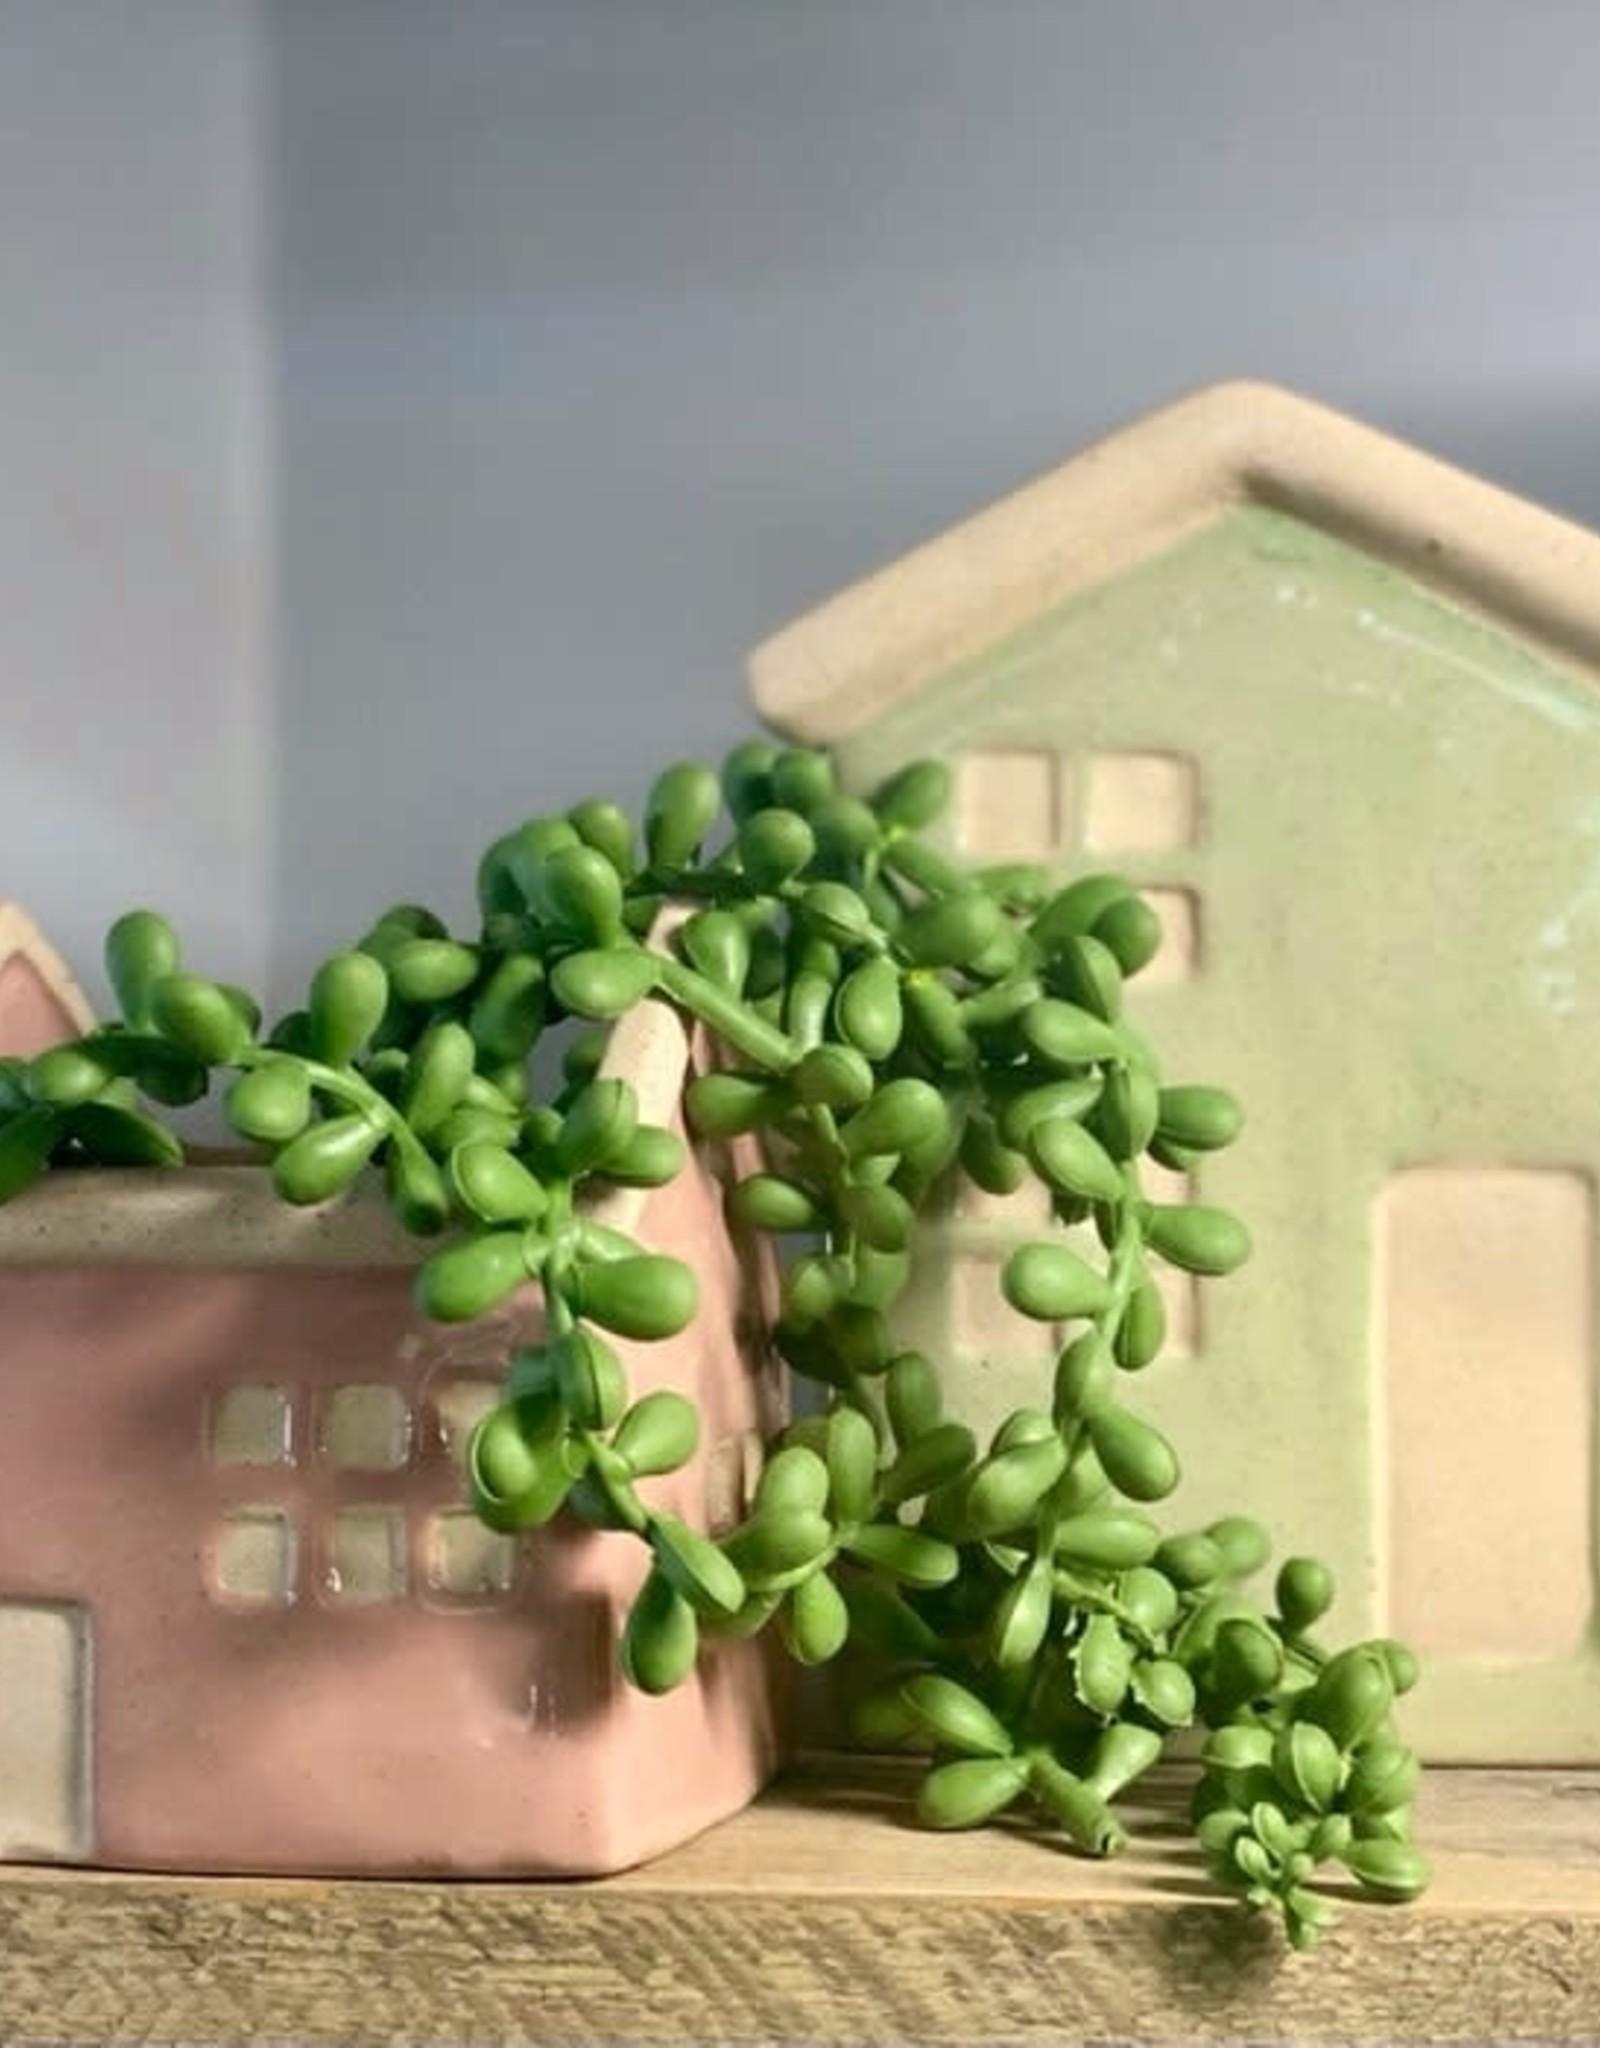 Urban products UG136157 Green Aspen House Planter